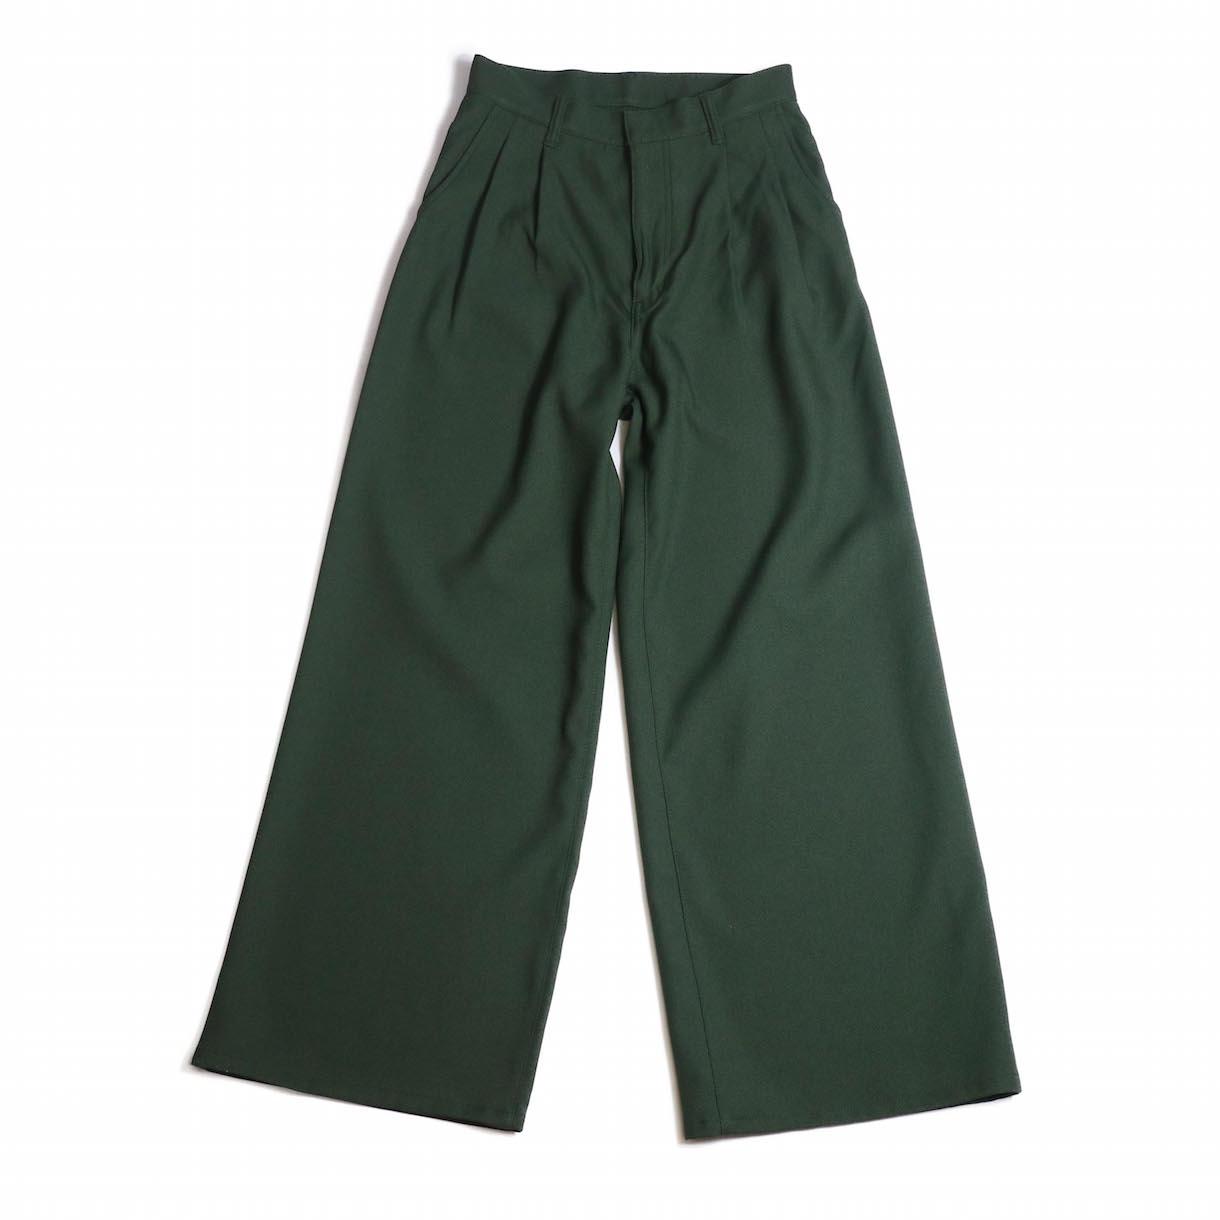 MY _ / STA PREST PANTS-DARK GREEN